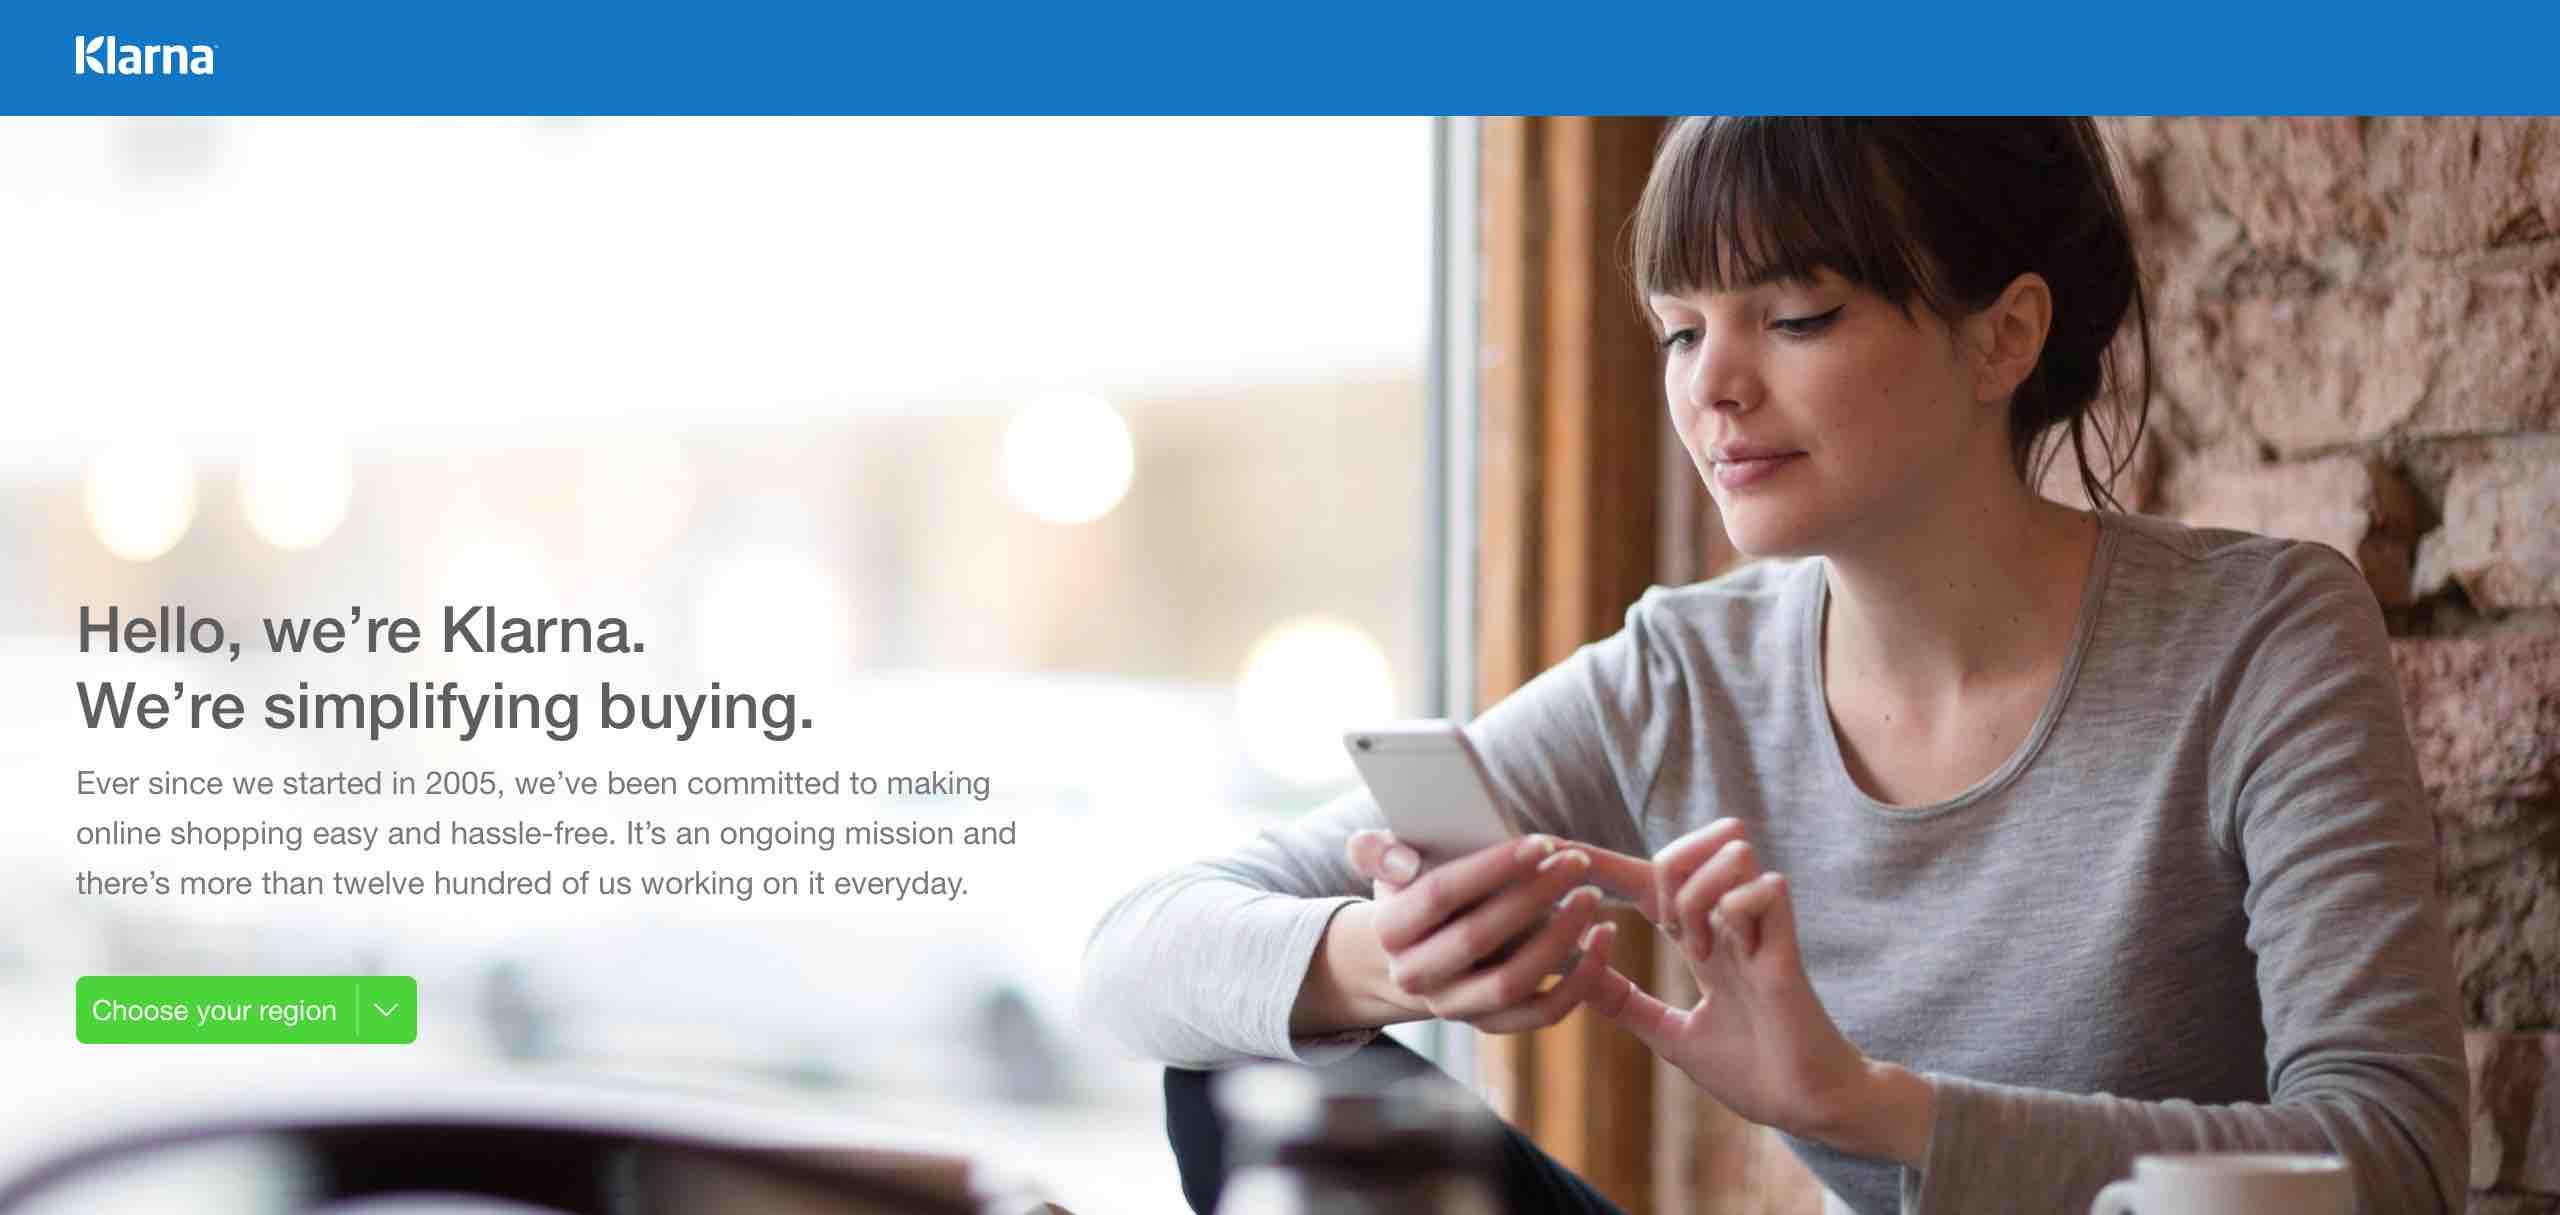 klarna e-commerce fizetesi szolgaltato webshop